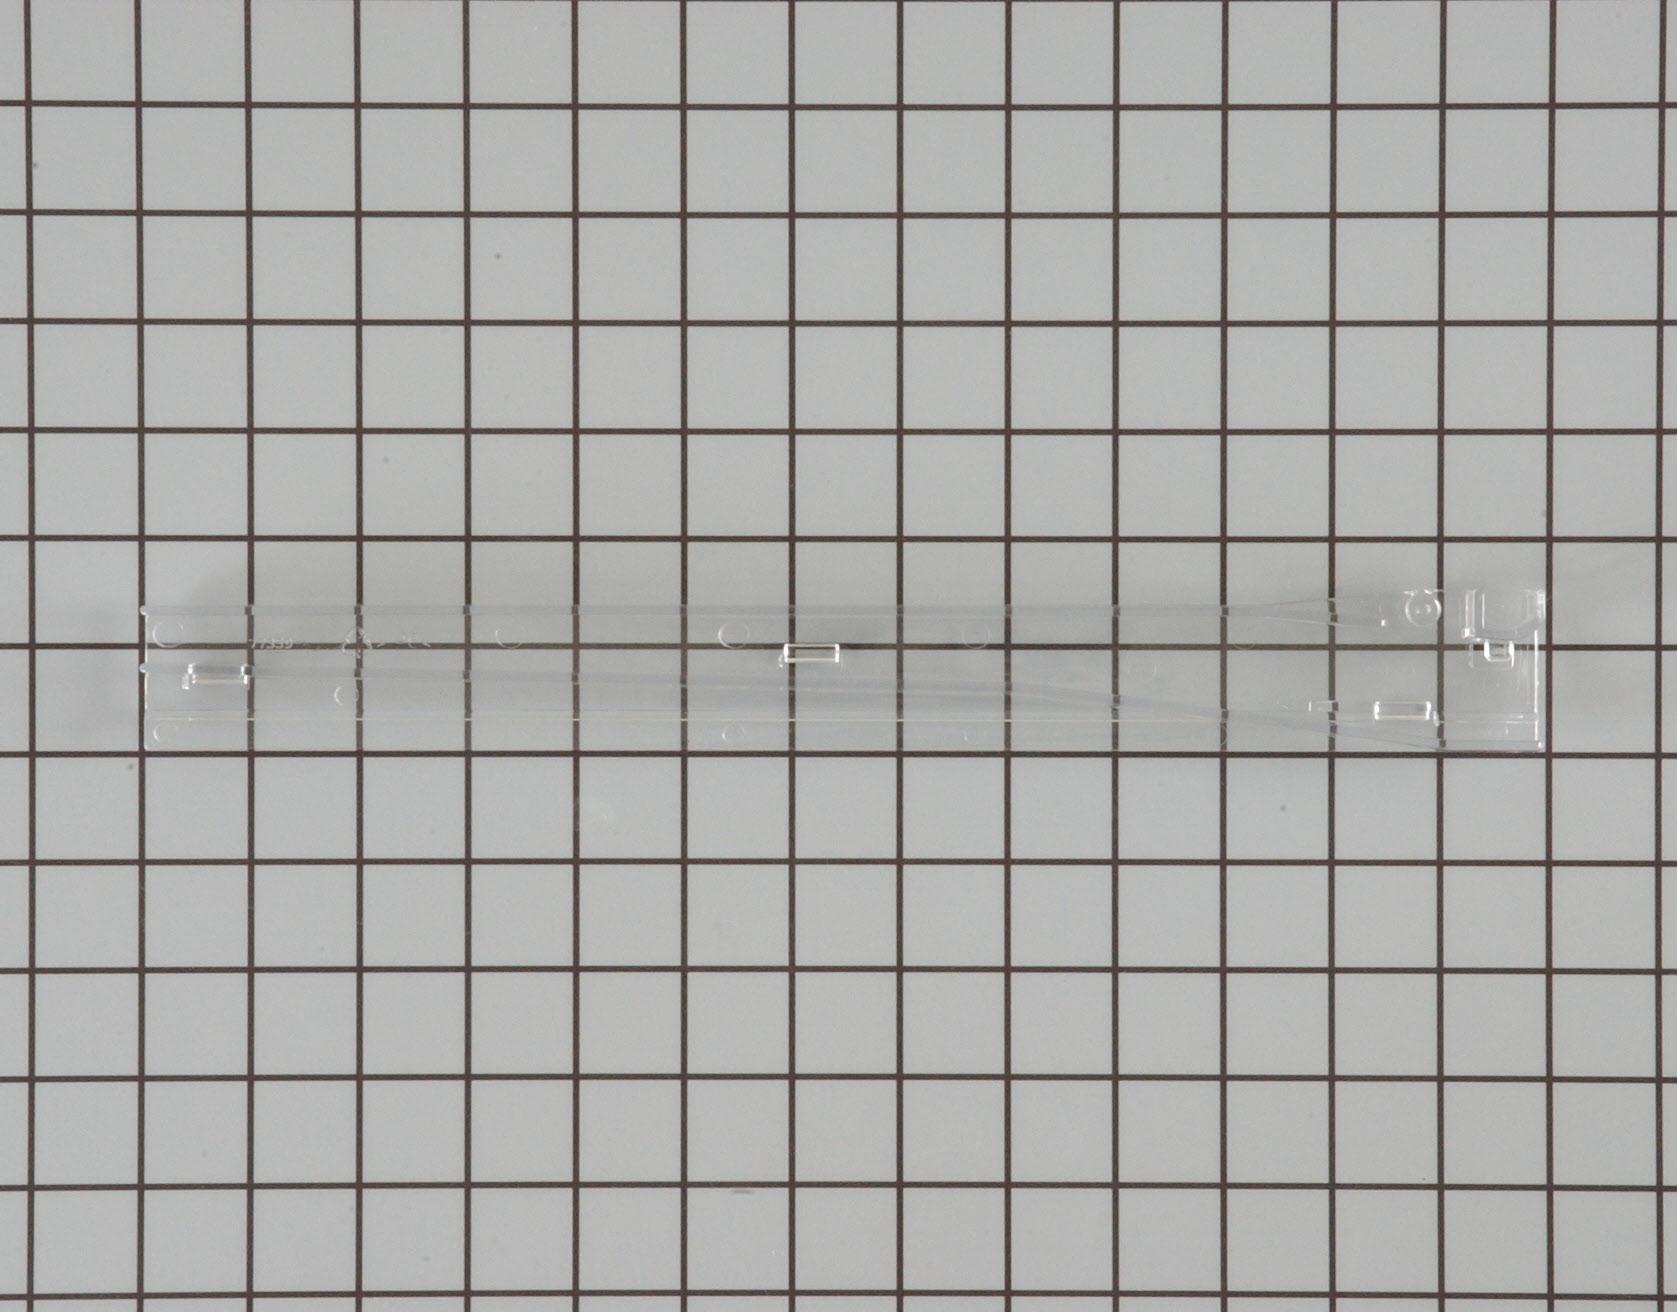 WP67002190 Crosley Refrigerator Part -Drawer Slide Rail